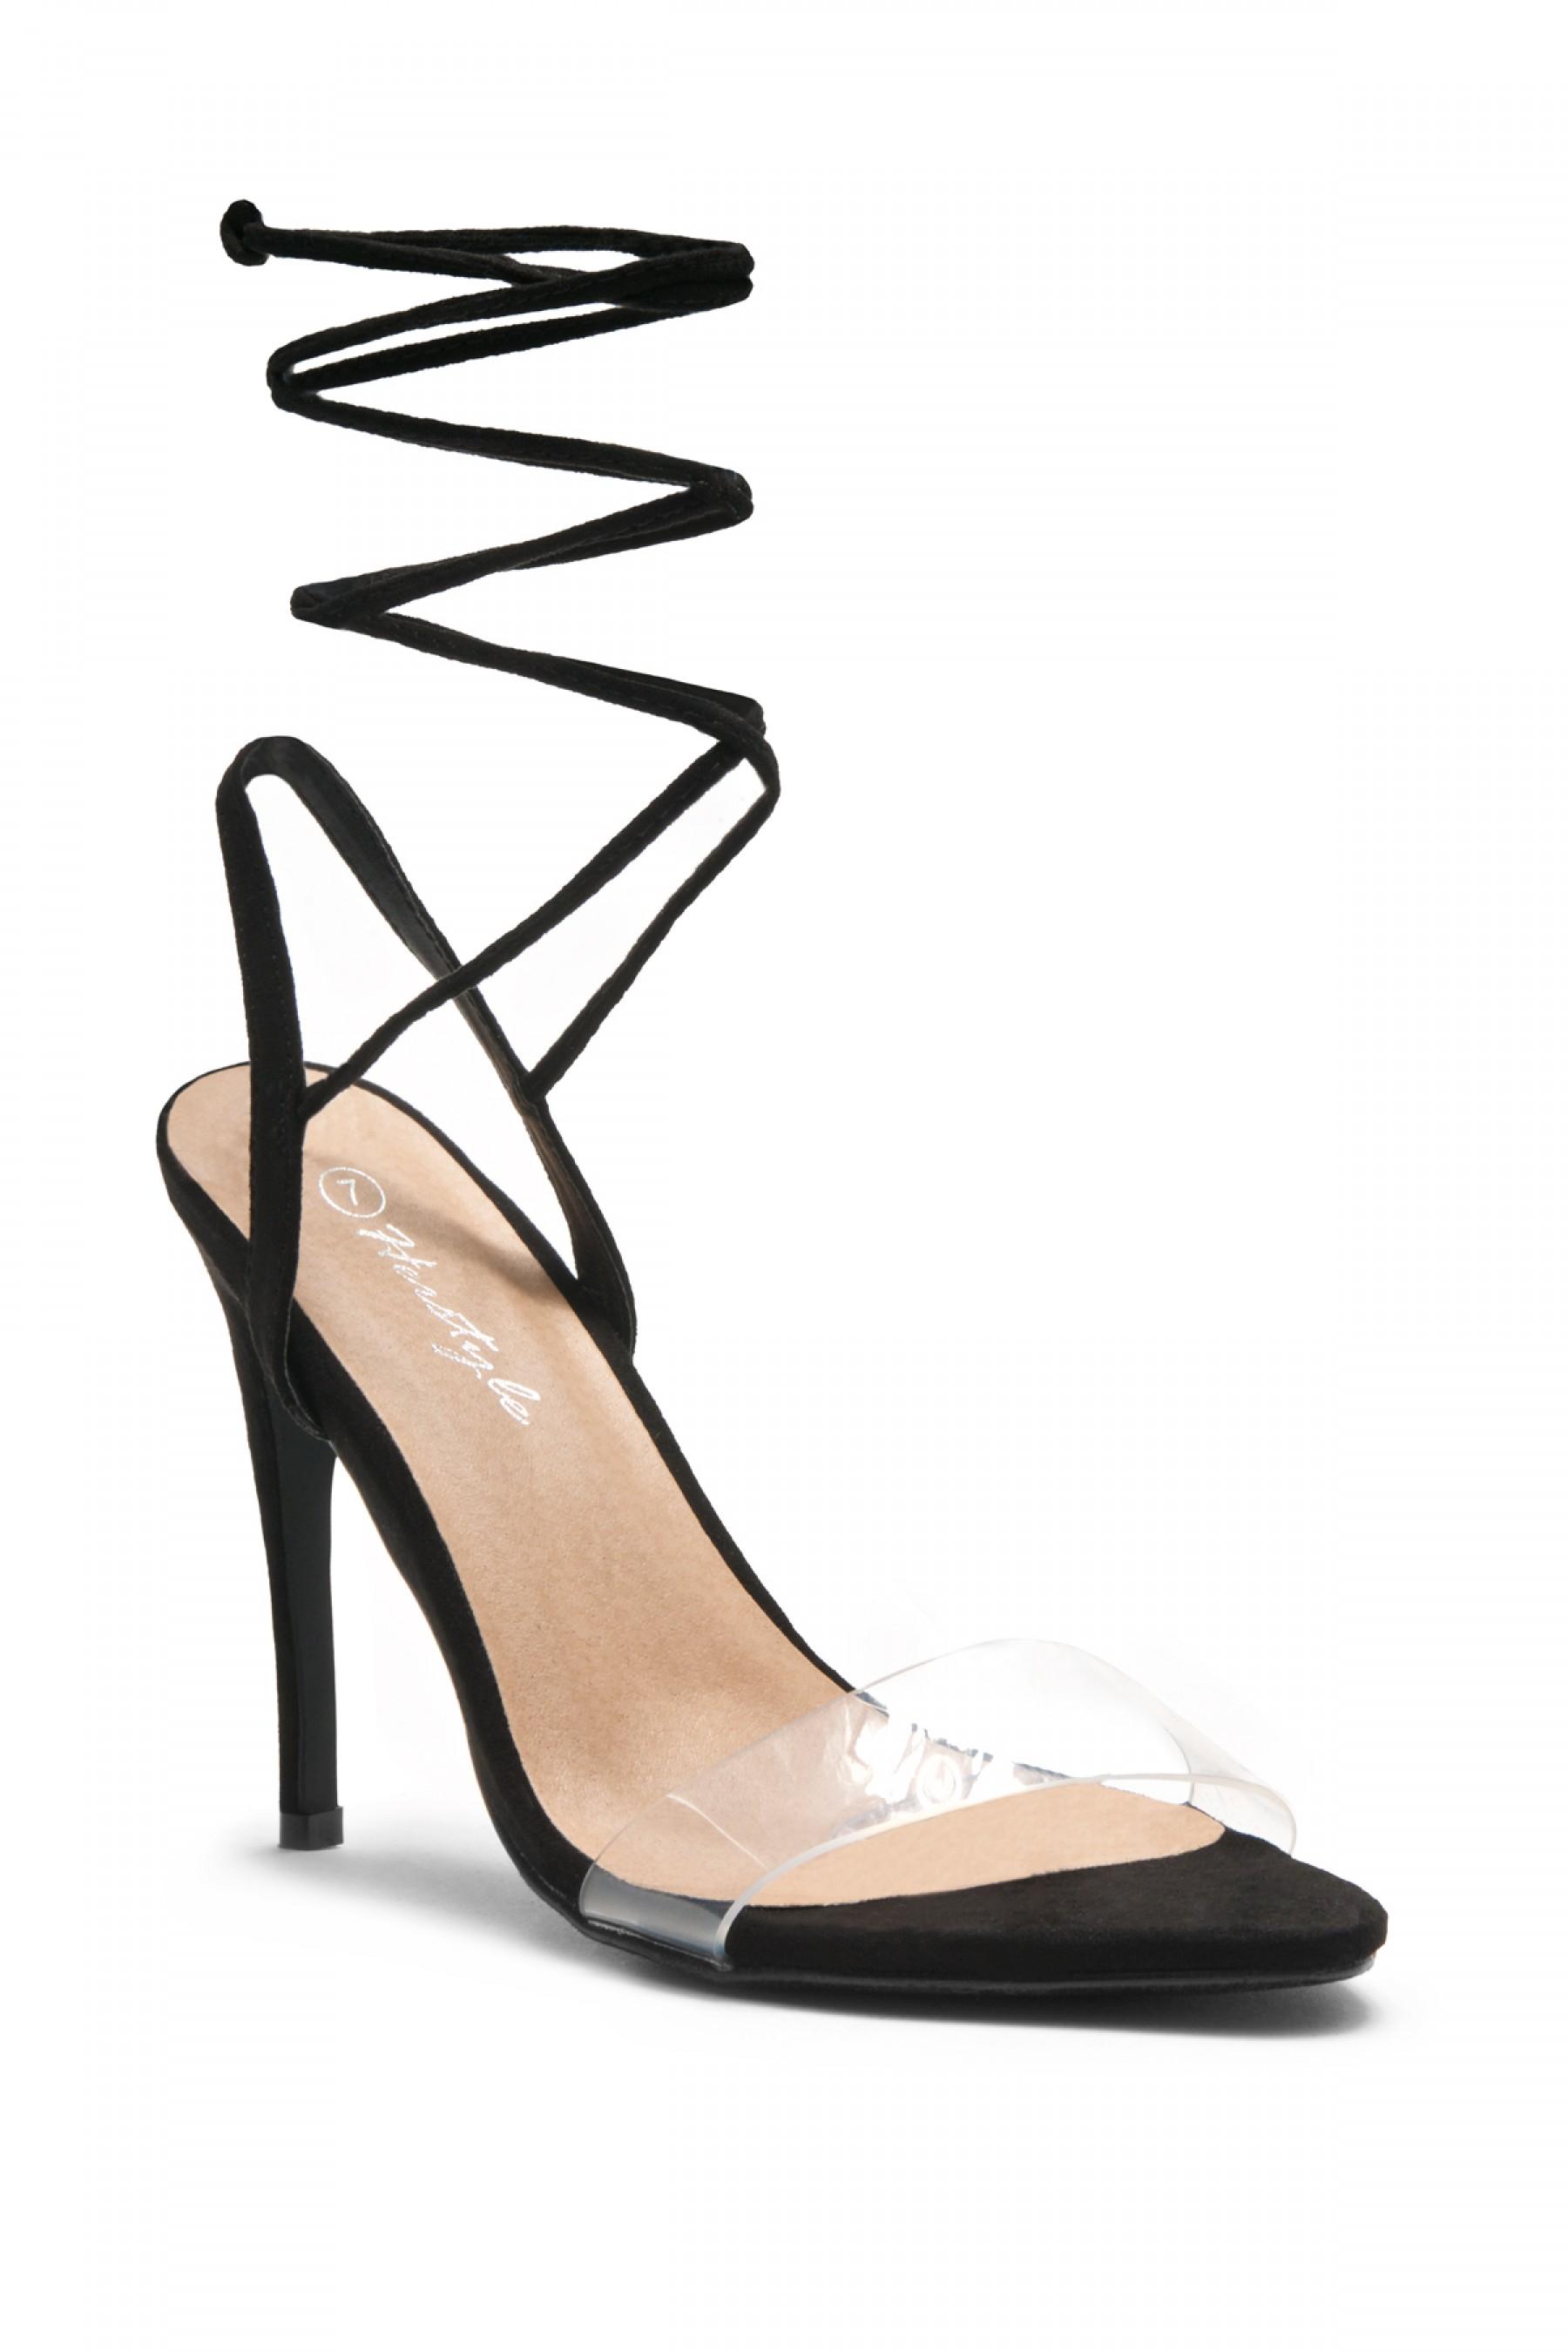 HerStyle Women's Manmade Senerra Suede Lucite Ankle-Tie Open Toe Stiletto Heel - Black